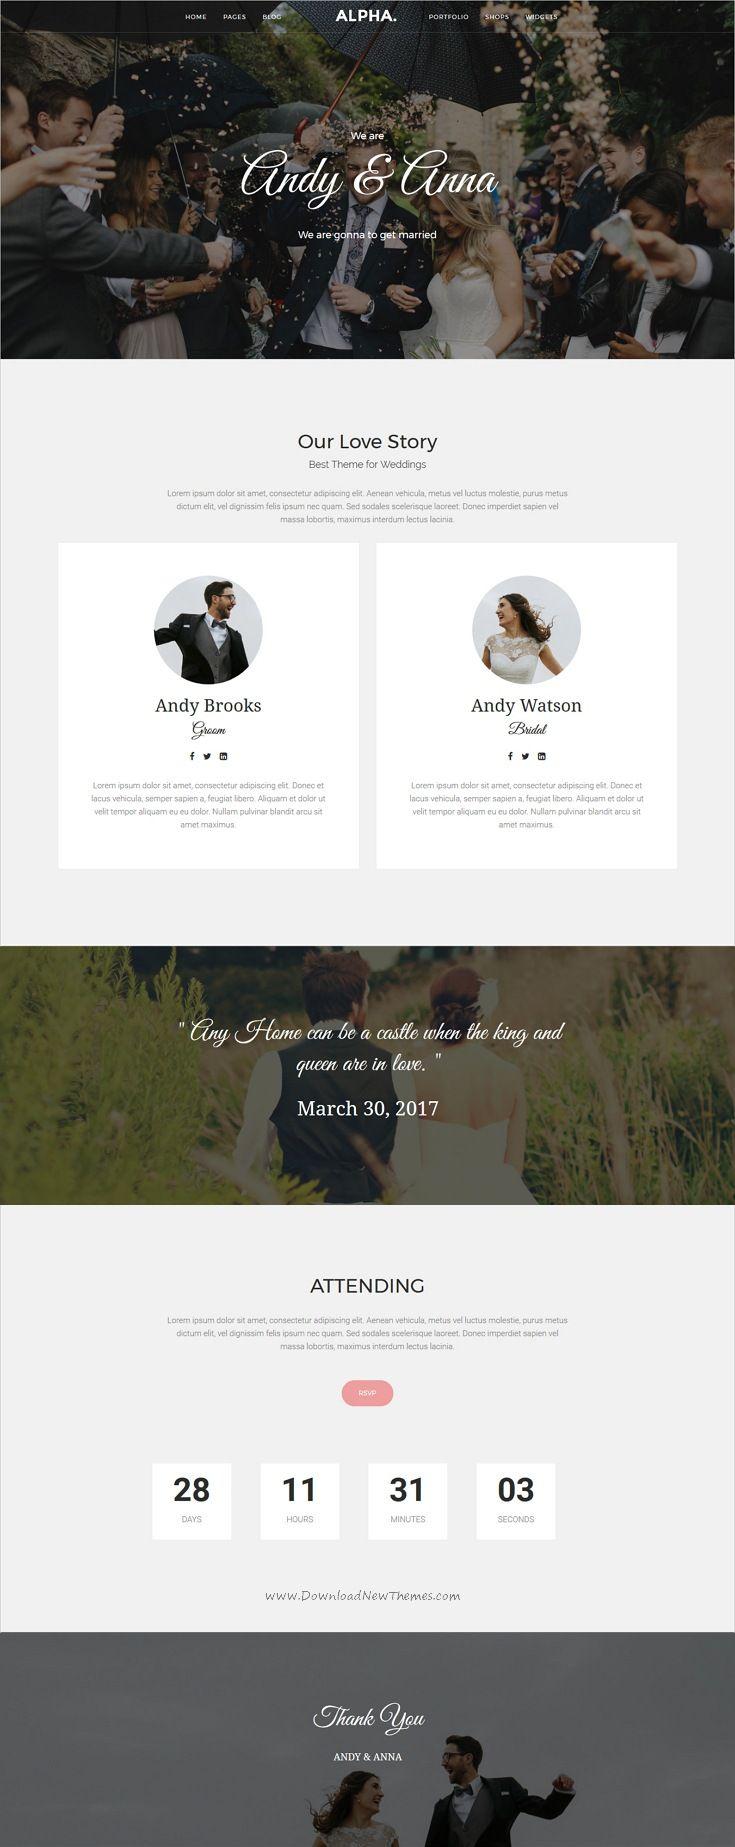 wedding invitation template themeforest%0A Alpha Dot Multi Purpose WordPress Theme  Bootstrap TemplateHtml  TemplatesInvitation WebsitesCreative Wedding